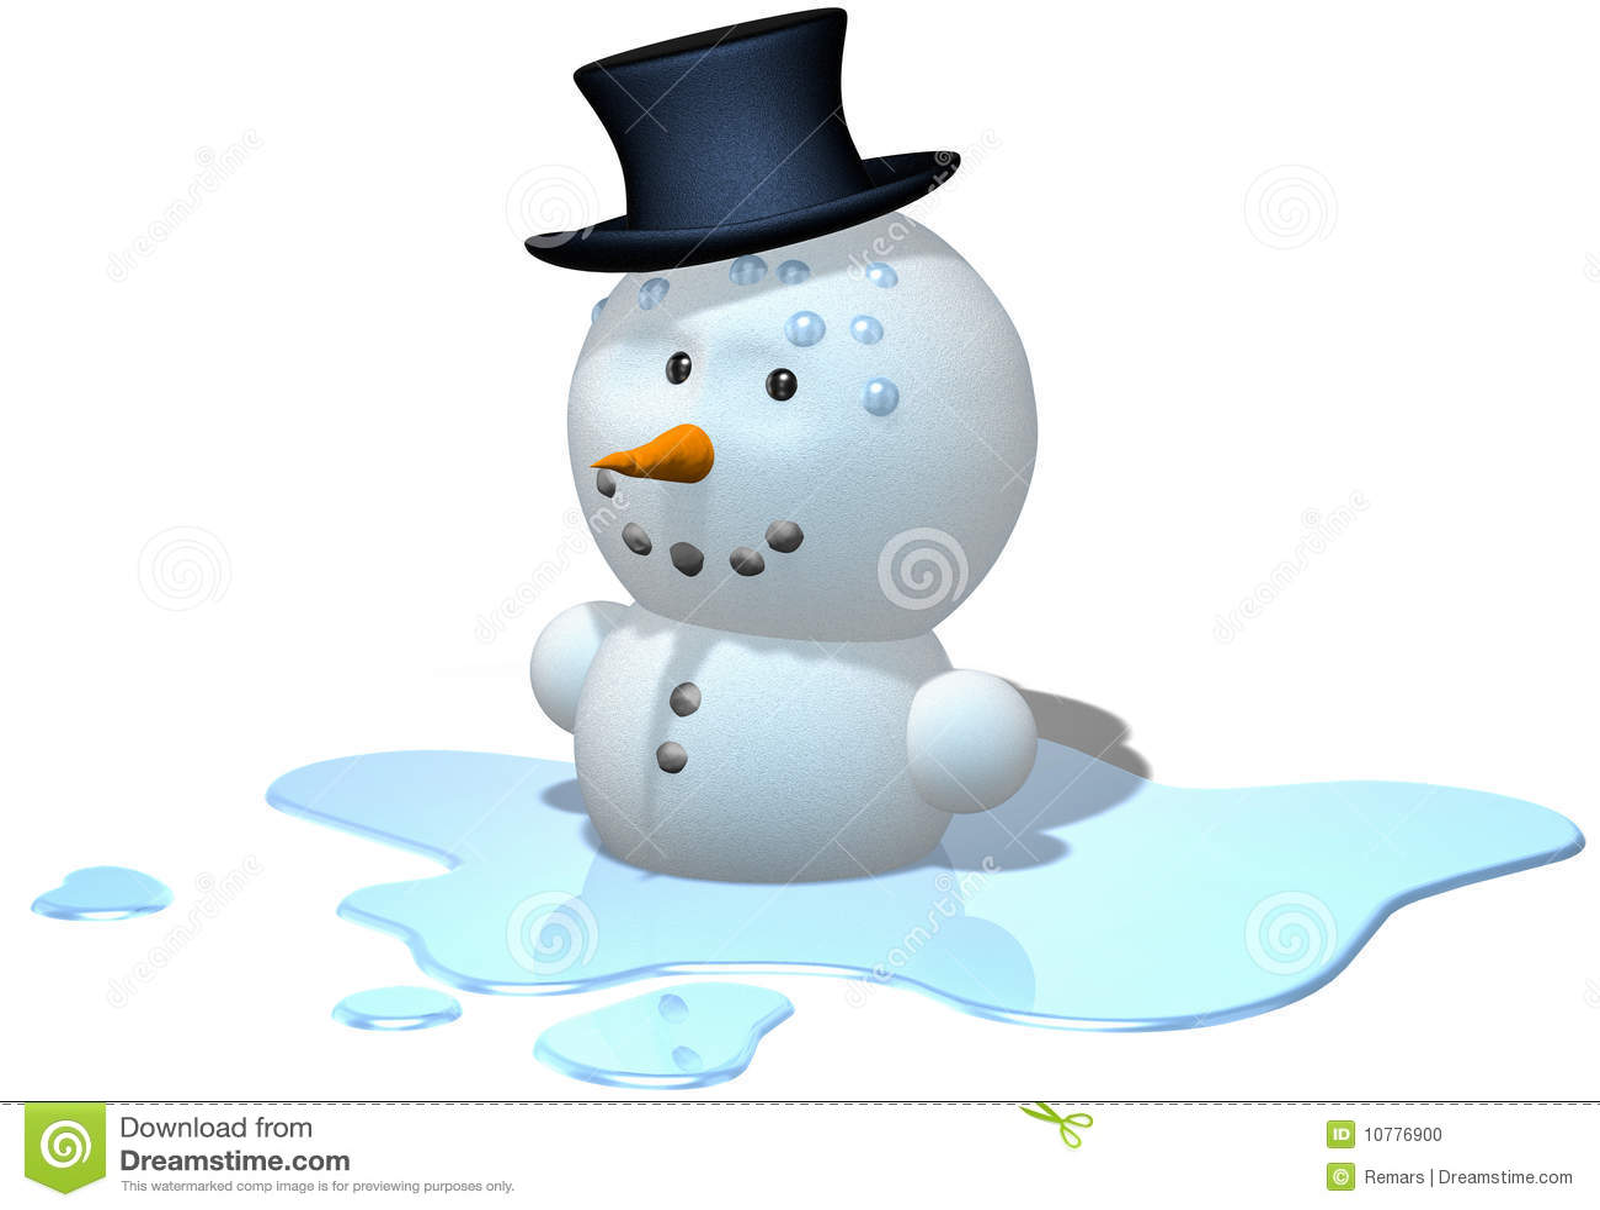 Melting Snowman Stock Illustrations – 107 Melting Snowman Stock ... for Melting Snowman Clipart  575lpg